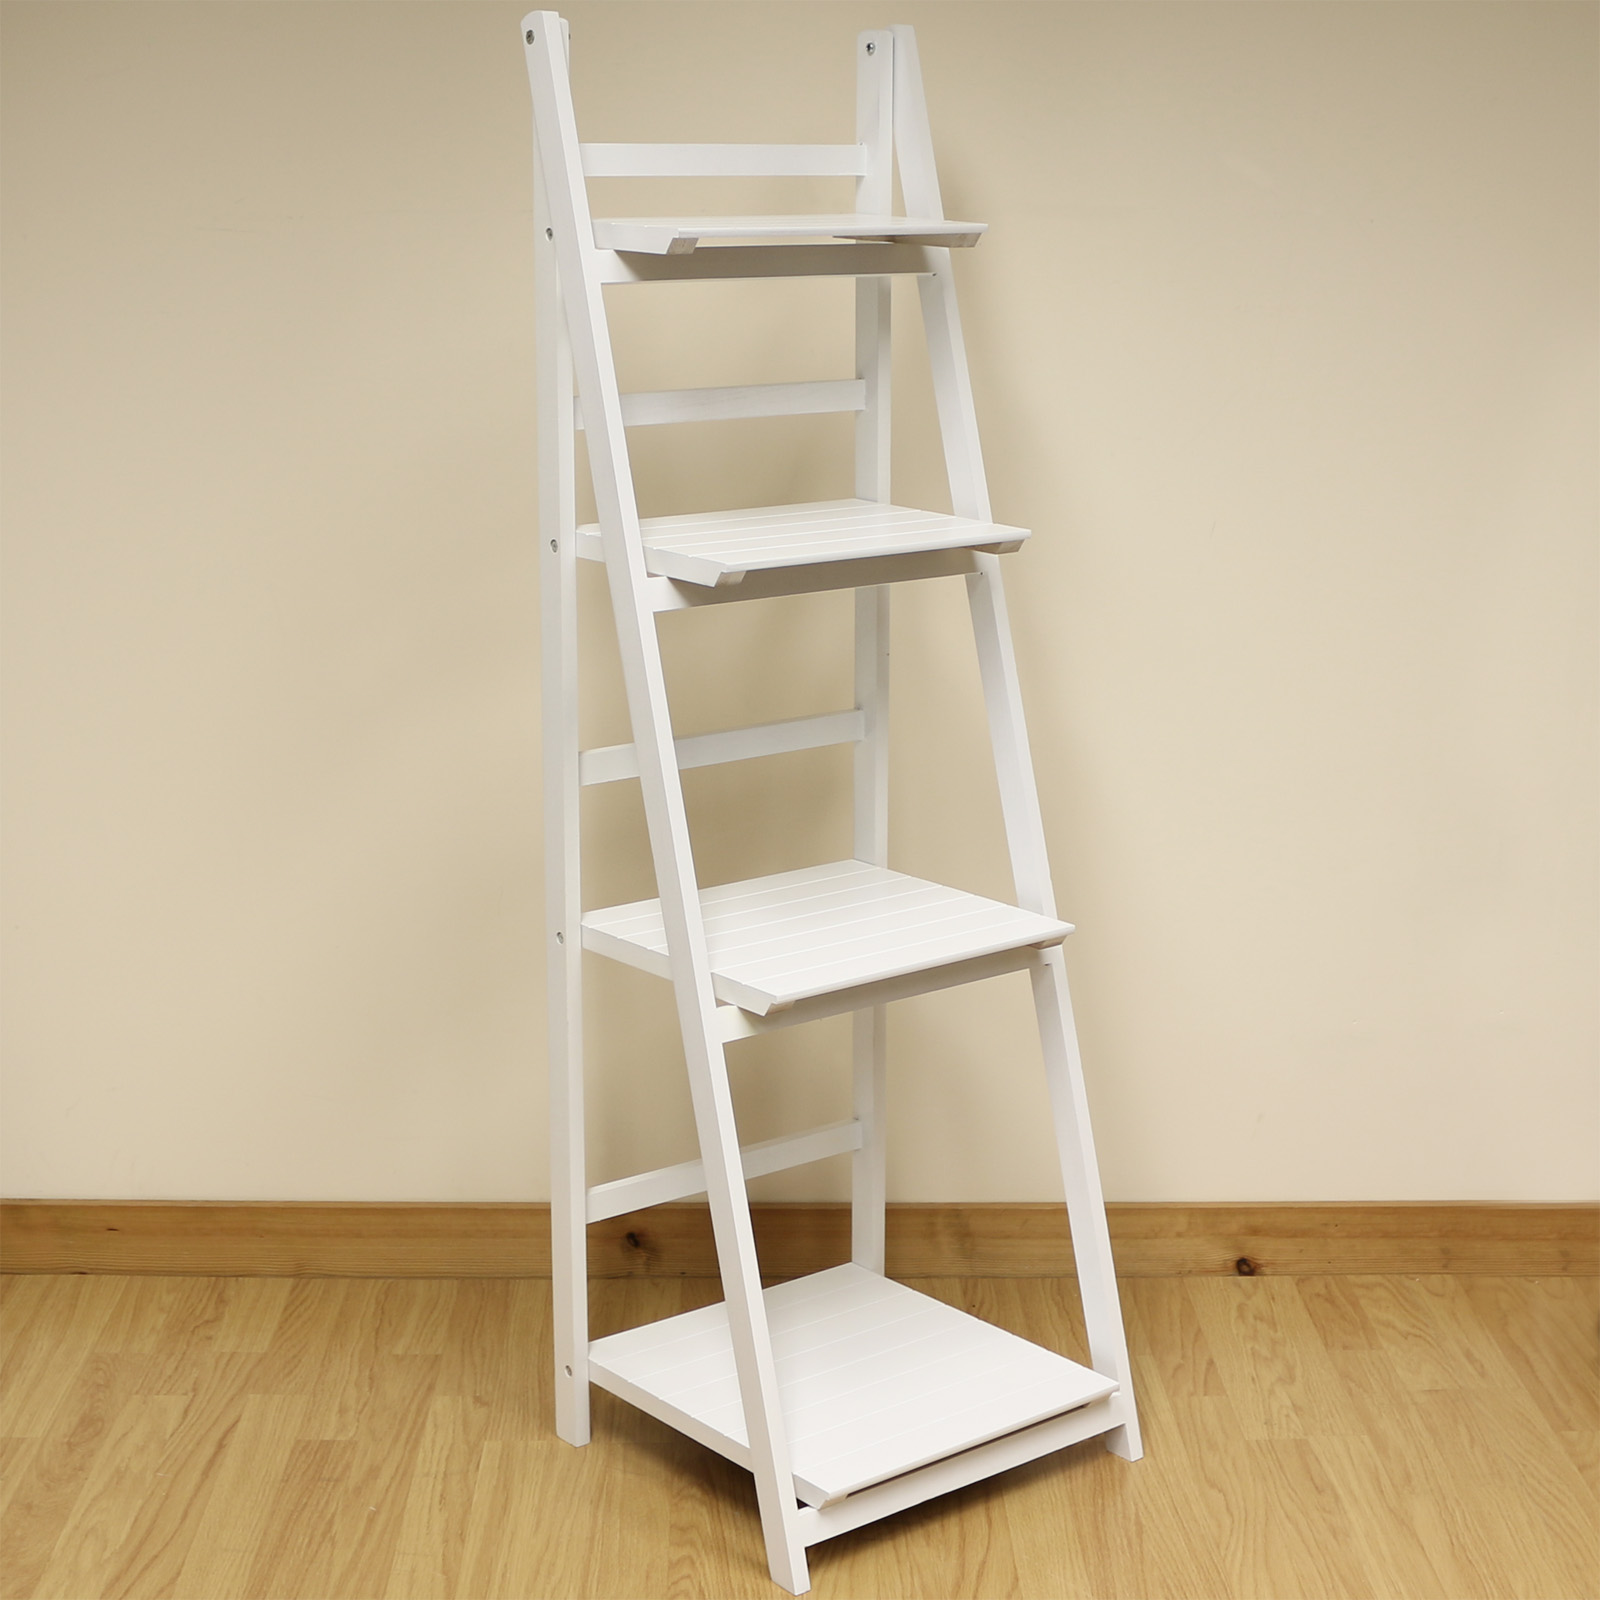 4 Tier White Ladder Shelf Display Unit Free Standing ...